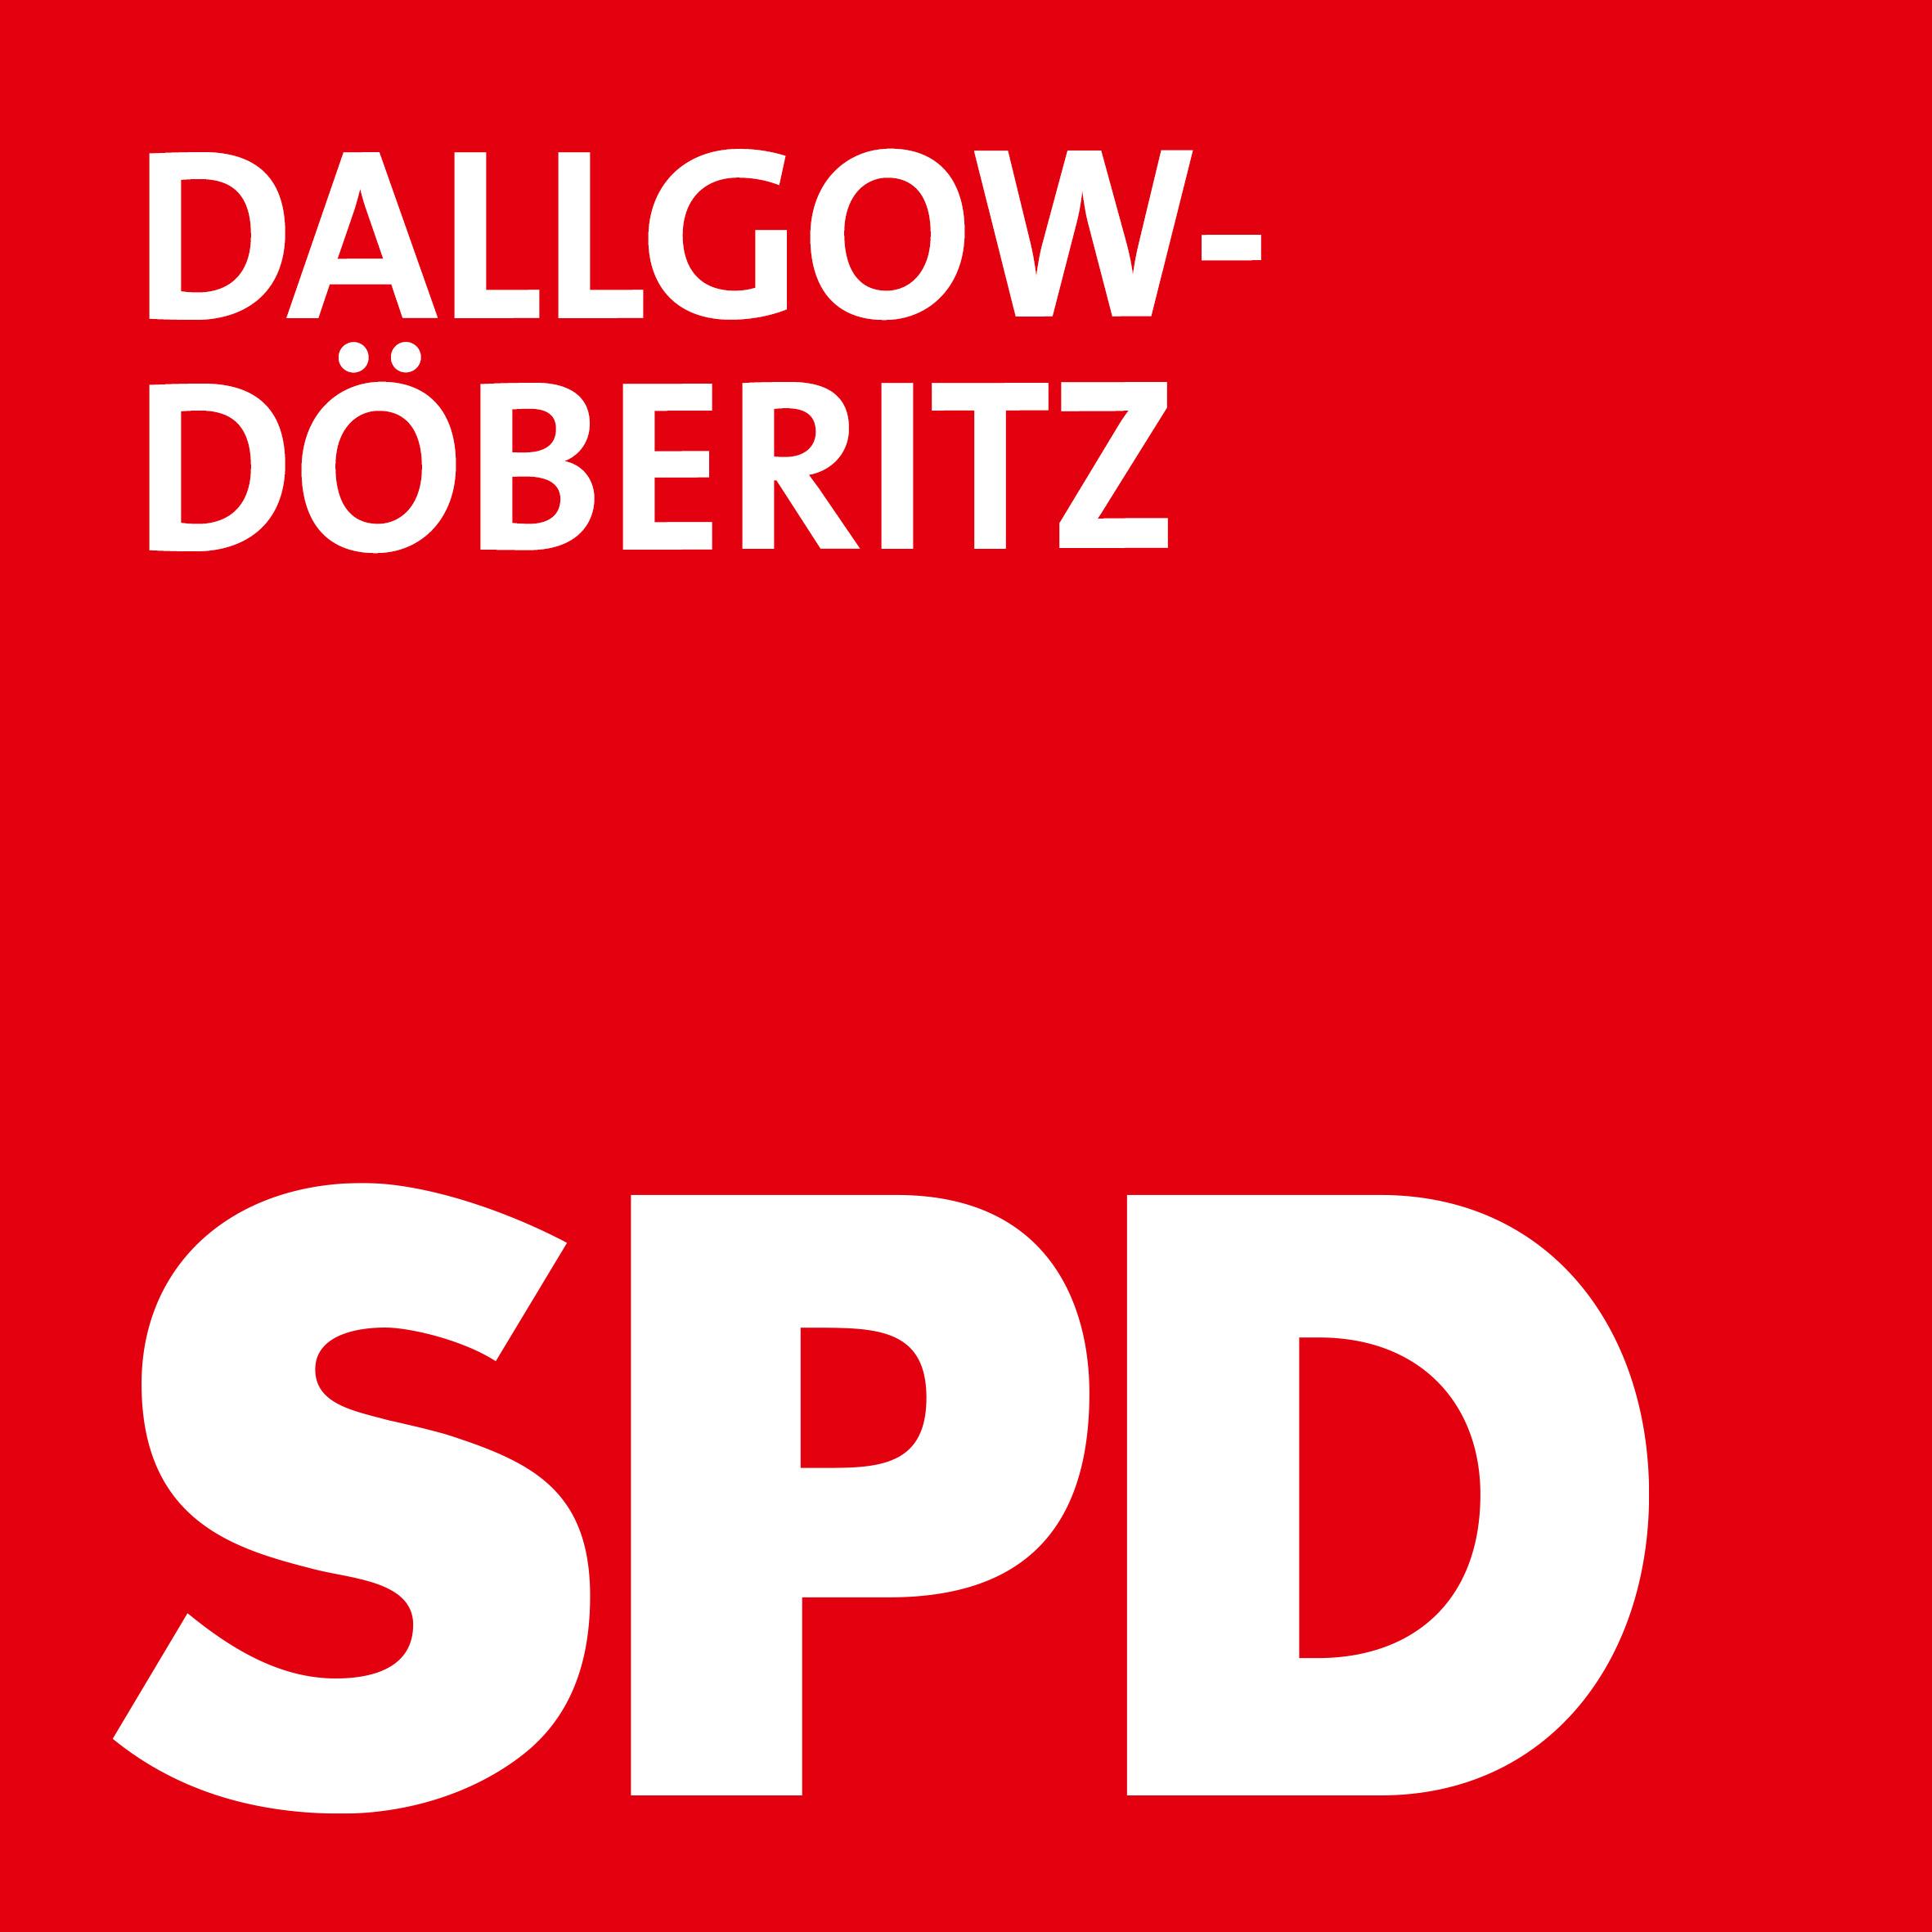 SPD Dallgow-Döberitz